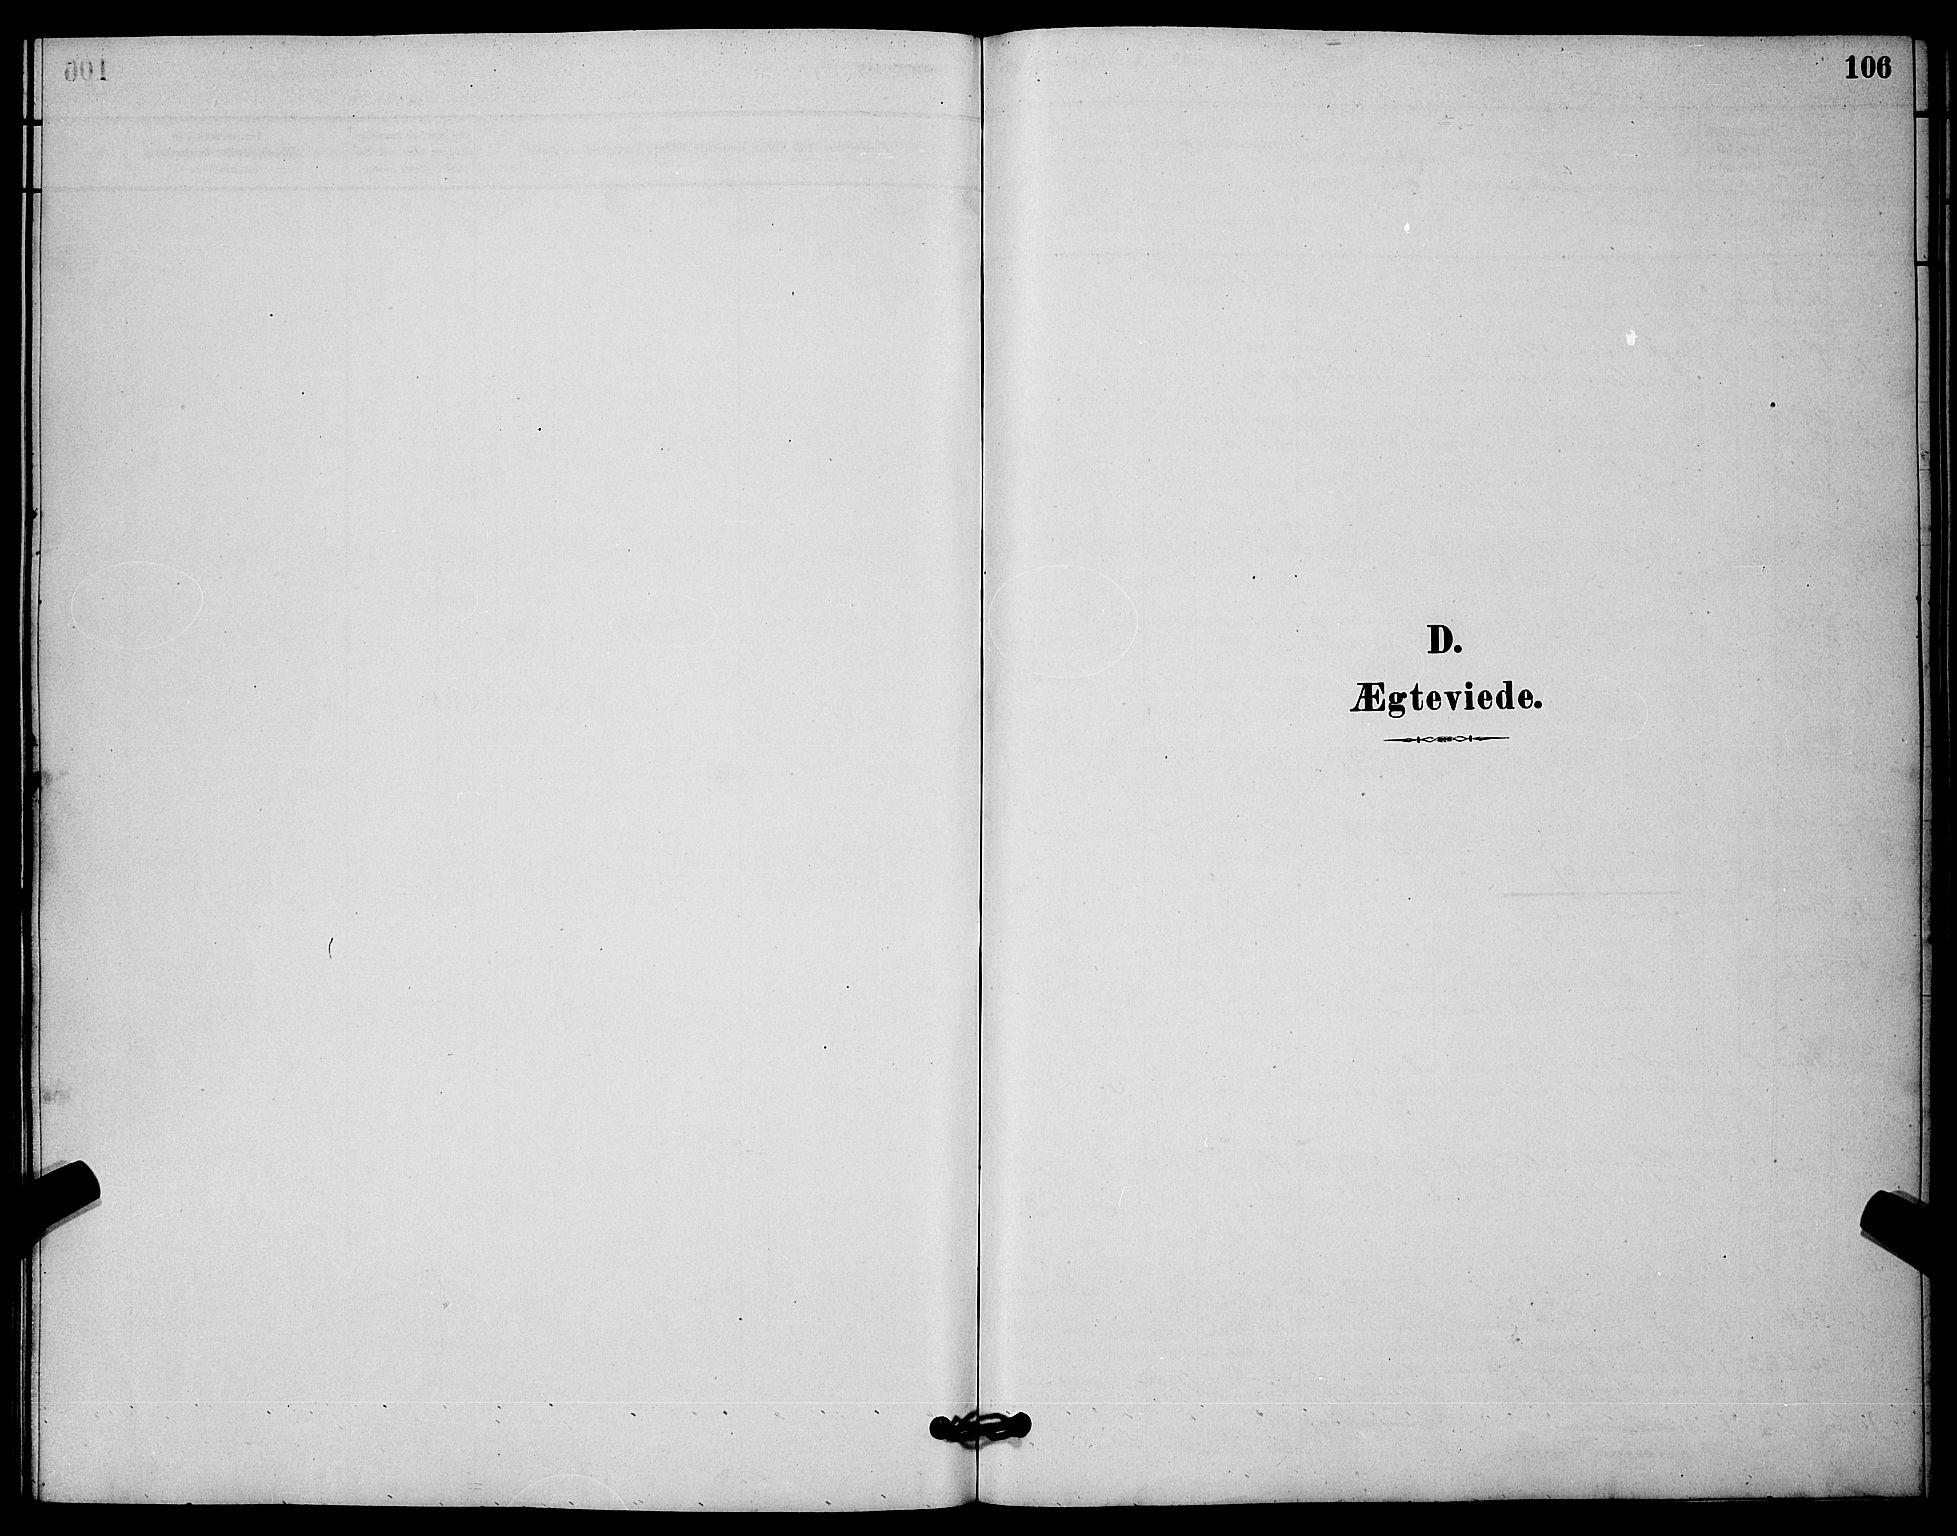 SAKO, Solum kirkebøker, G/Gb/L0003: Klokkerbok nr. II 3, 1880-1898, s. 106